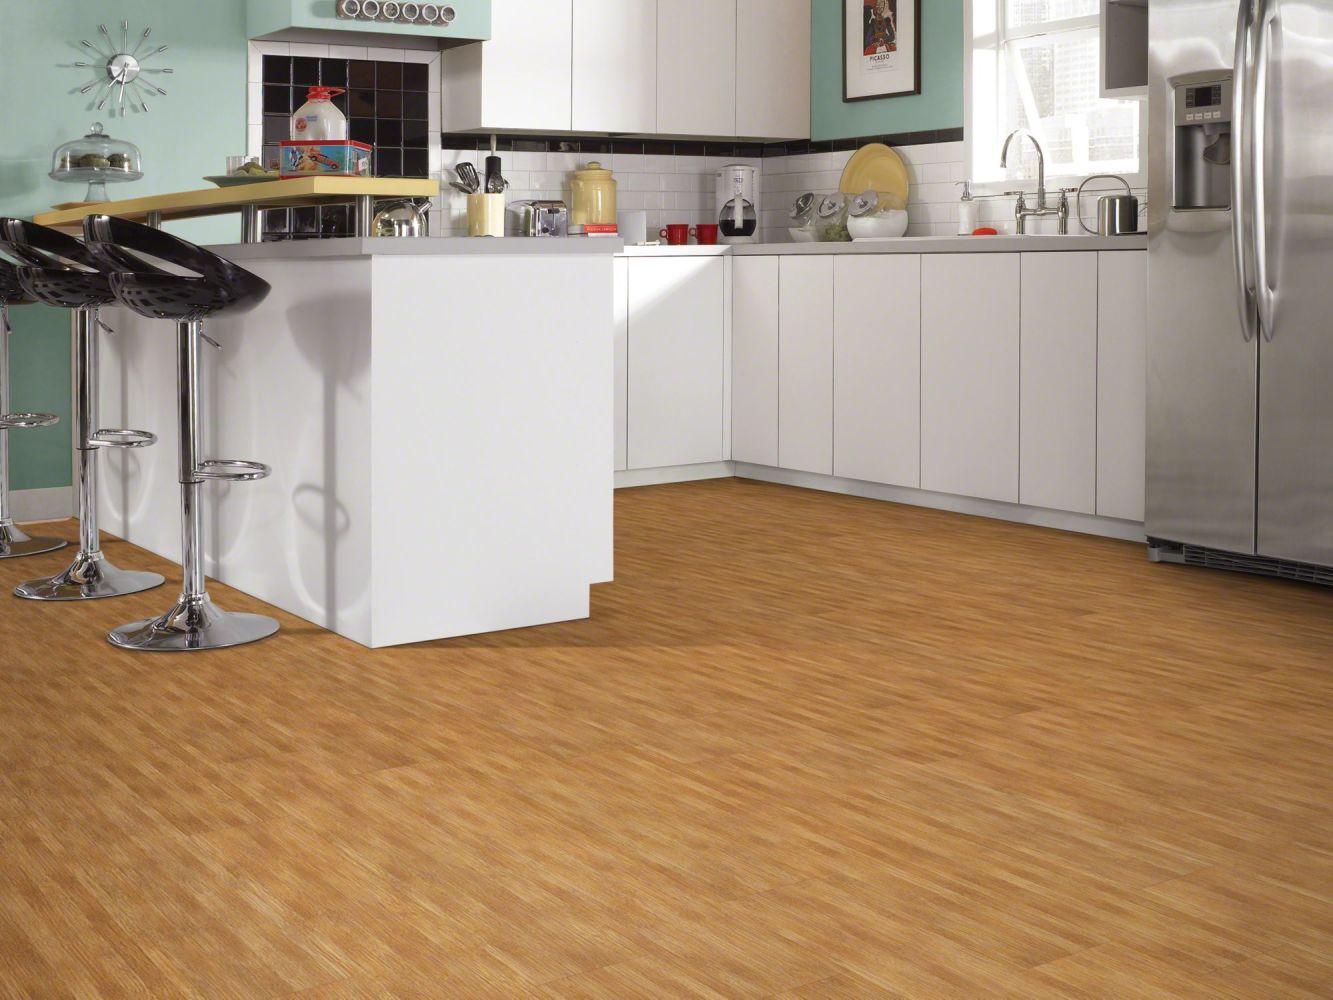 Shaw Floors Resilient Residential Urbanality 12 Plank Bridgeway 00768_0310V